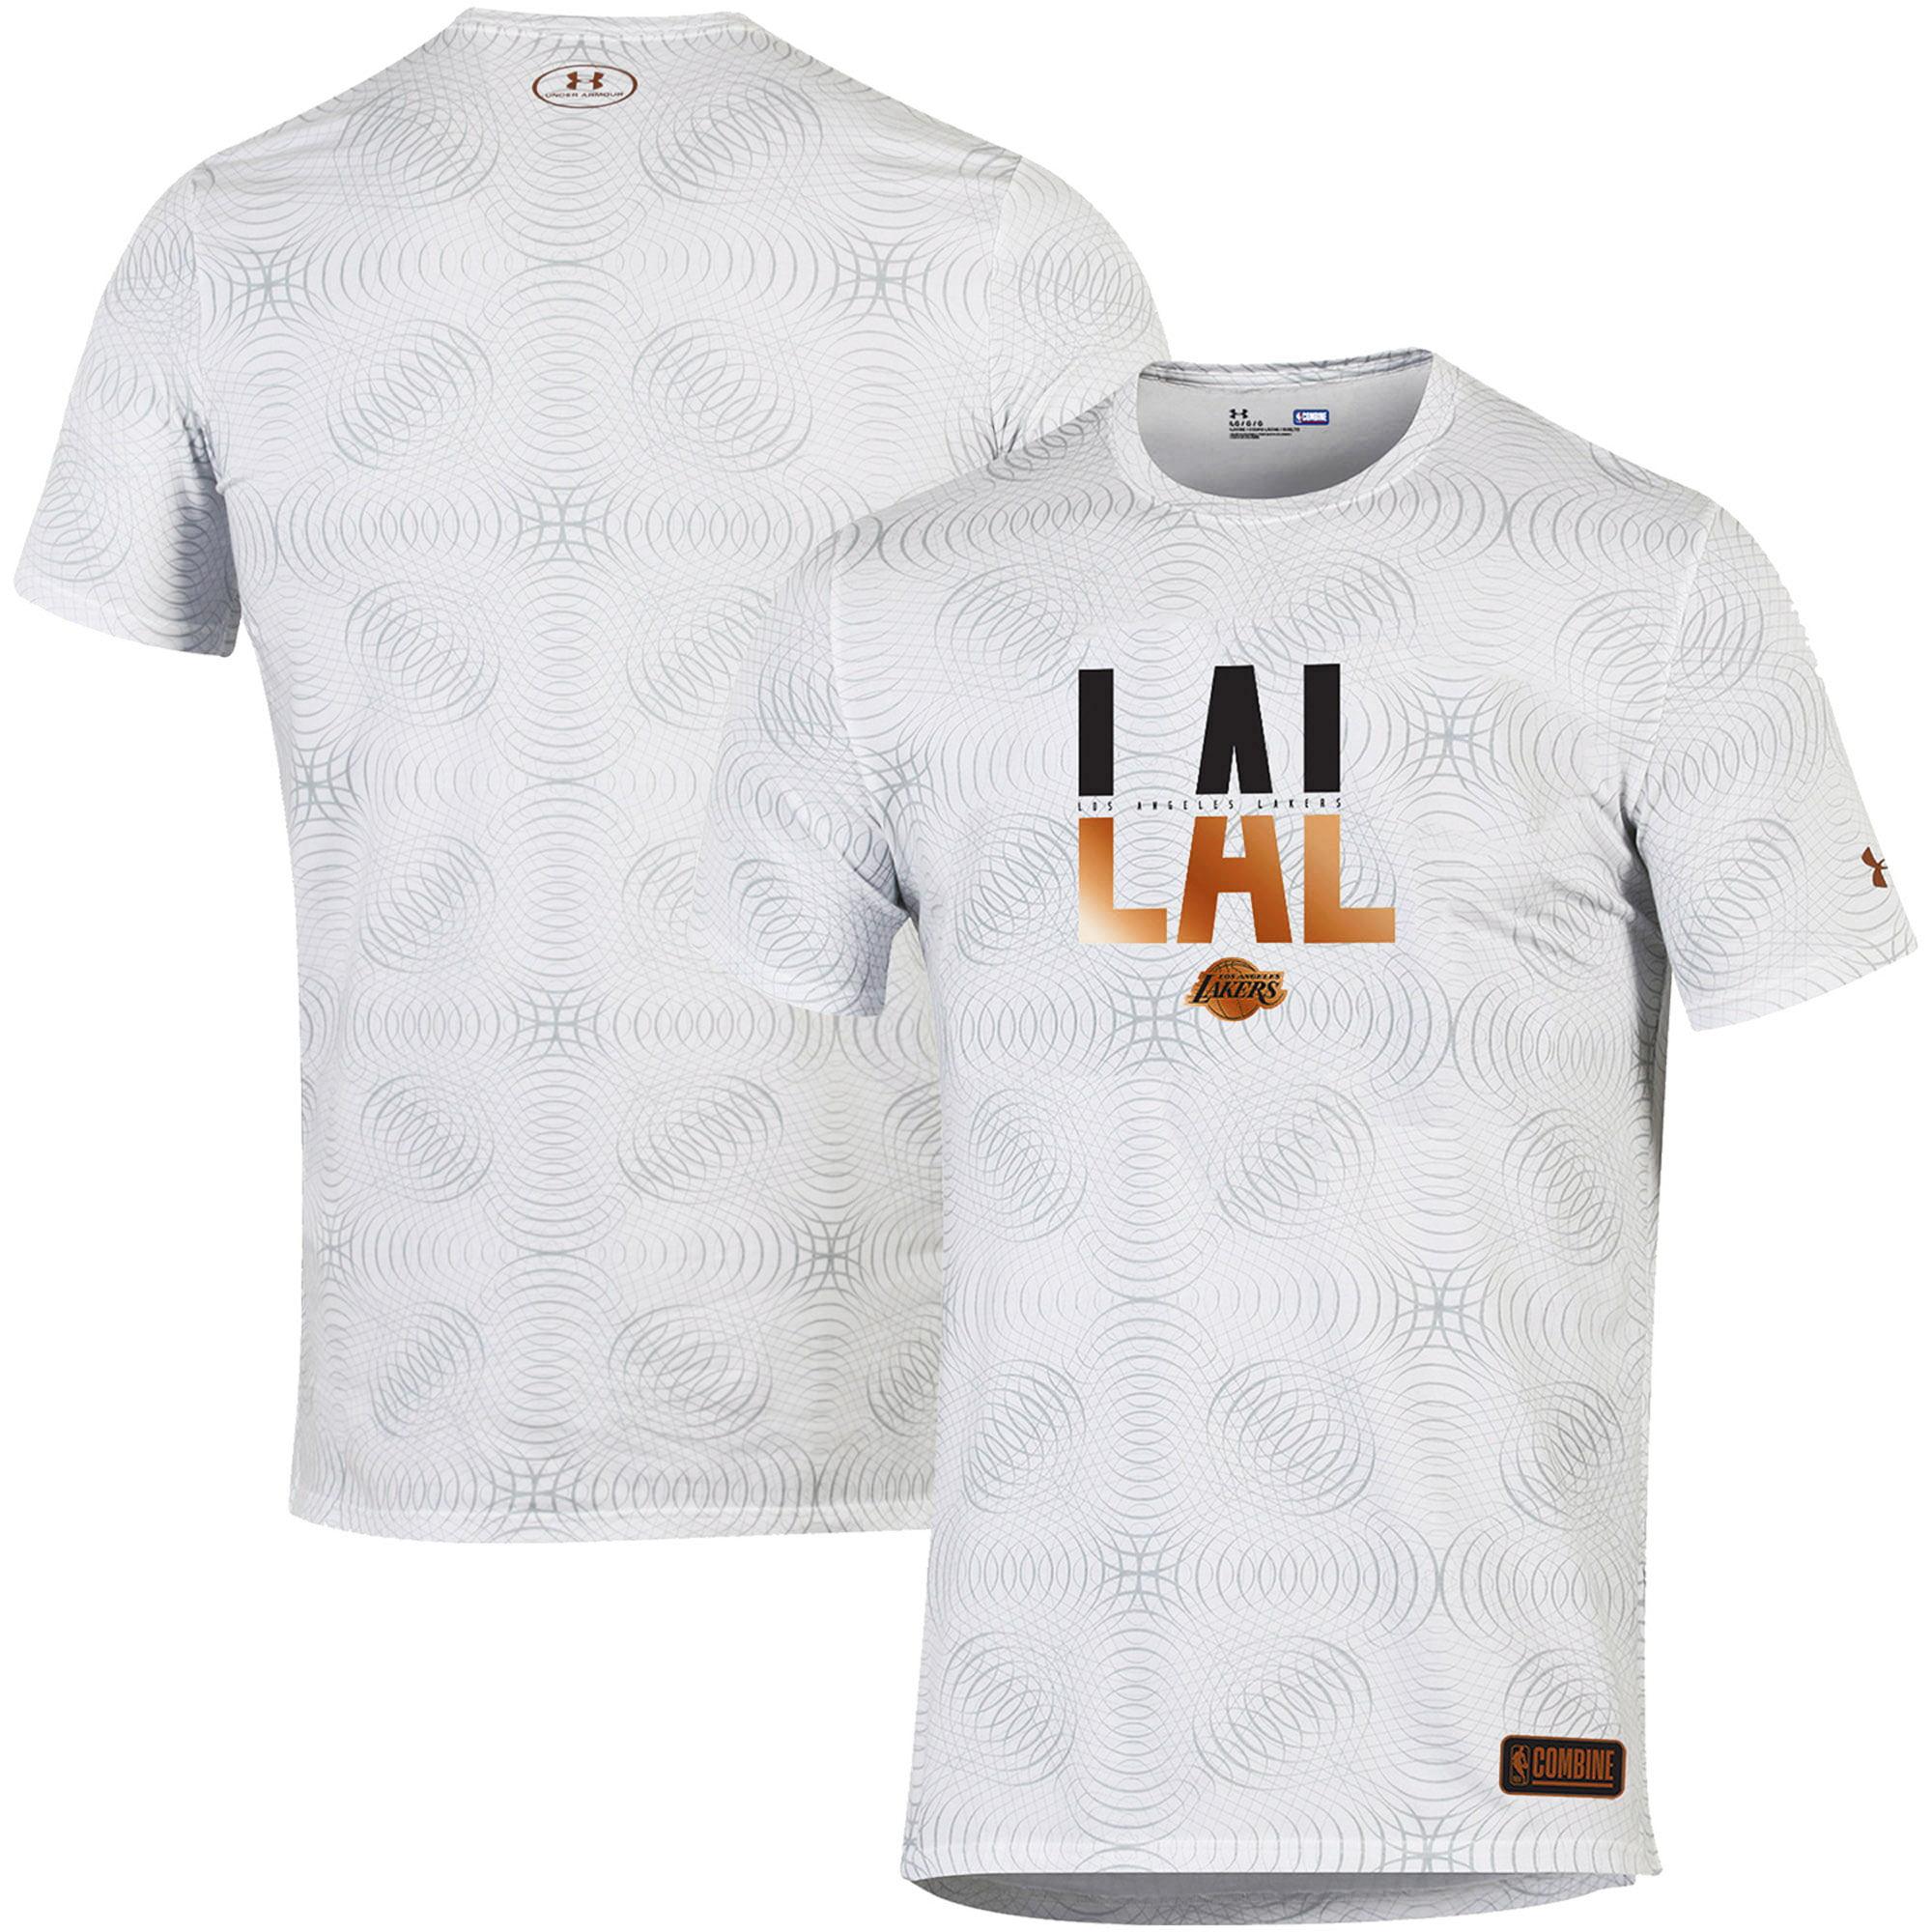 Los Angeles Lakers Under Armour Combine Authentic Alpha Long Line Tri-Blend Performance T-Shirt - White